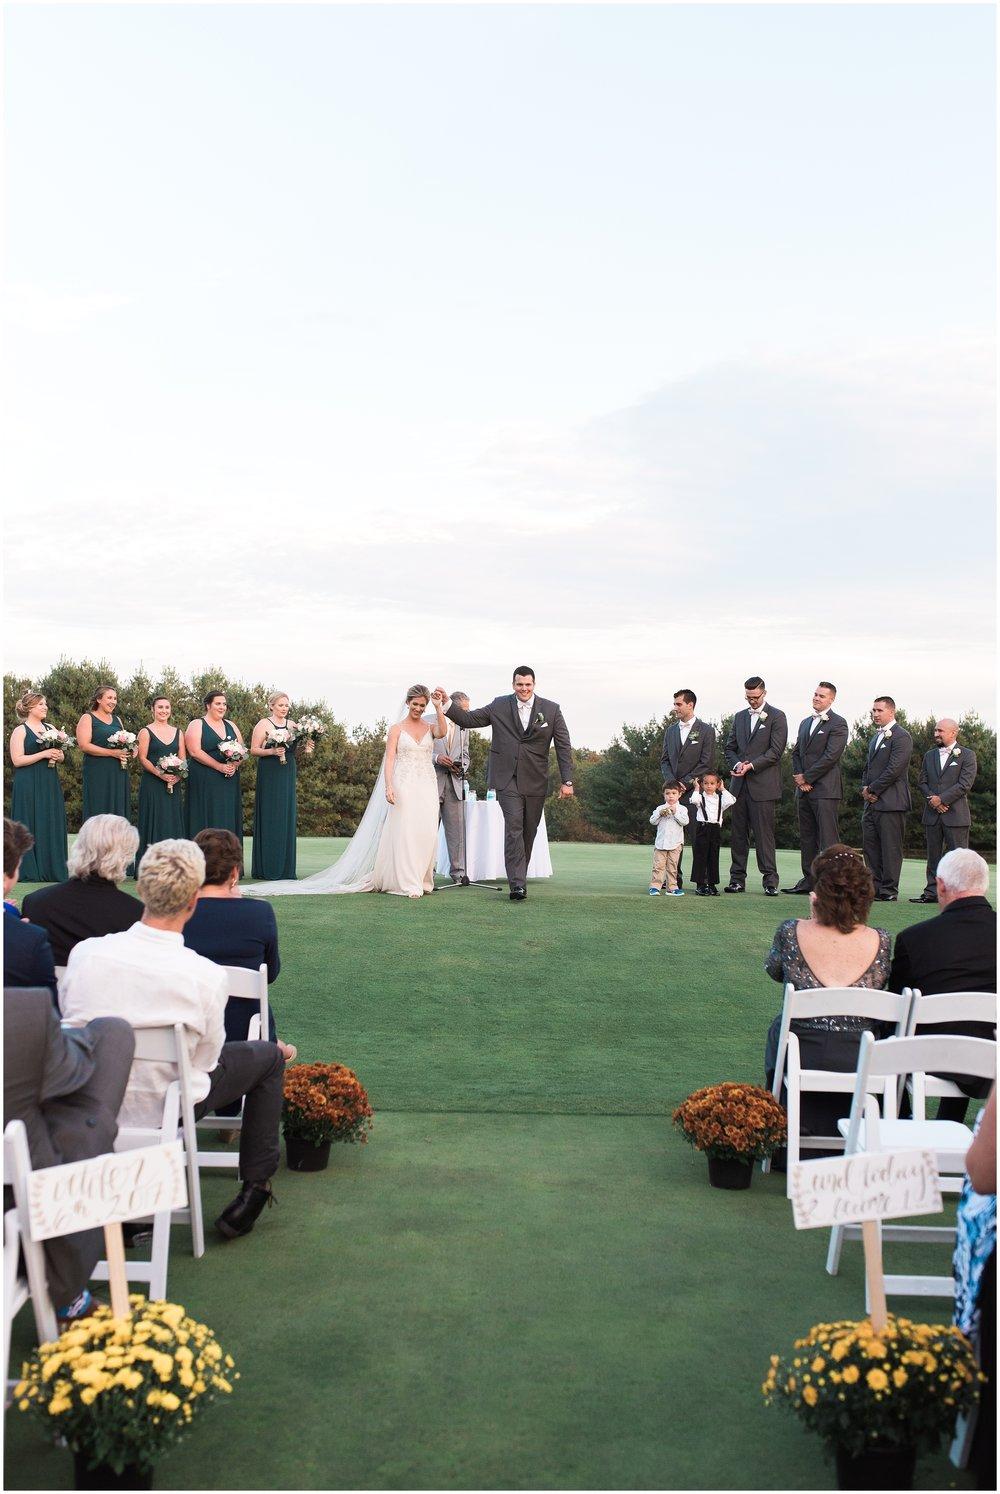 NJ-Basking-Ridge-Country-Club-Wedding-Fall-Photo_0093.jpg